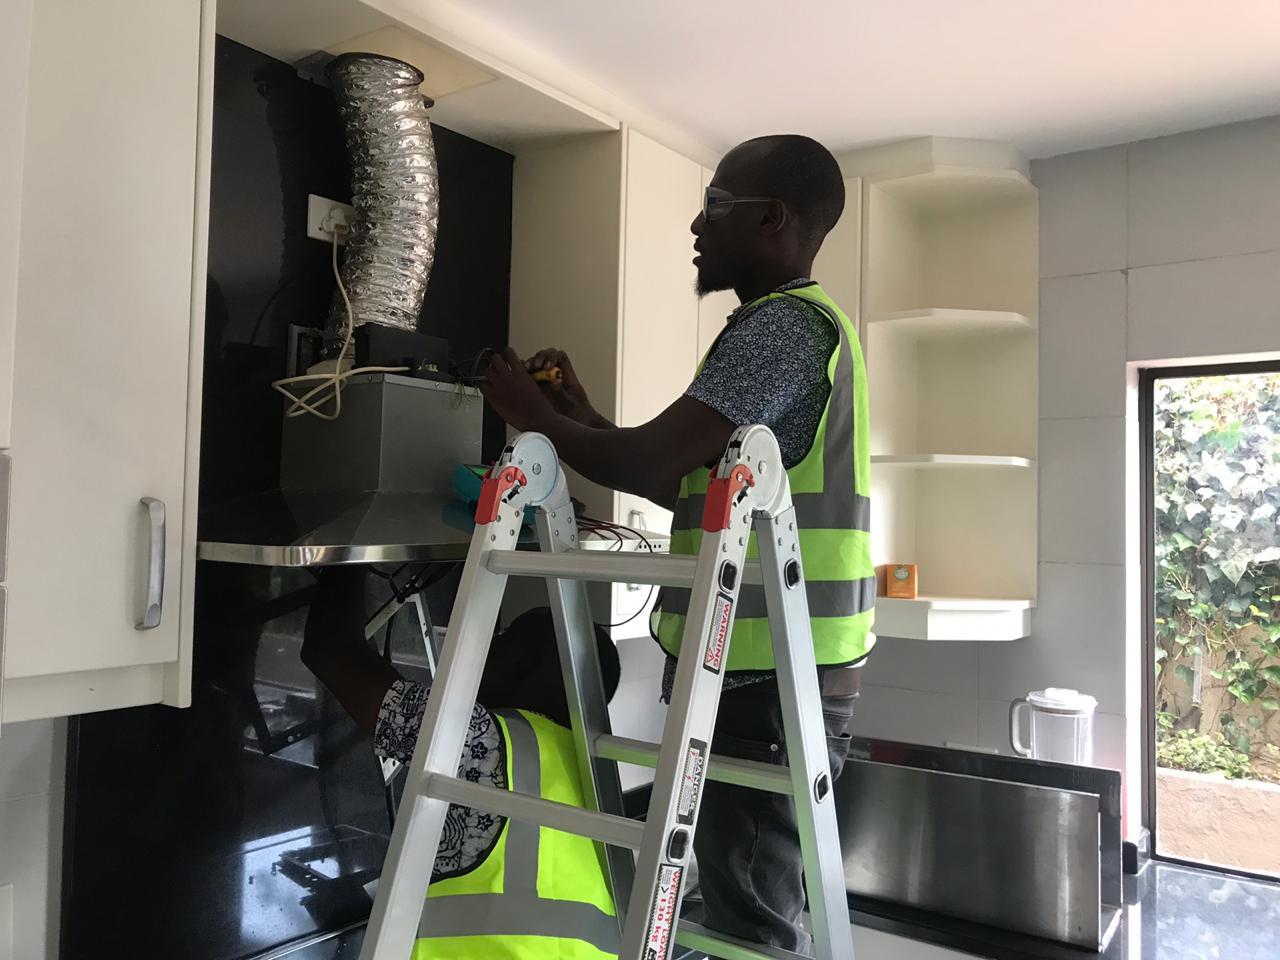 Extractor fan repairs